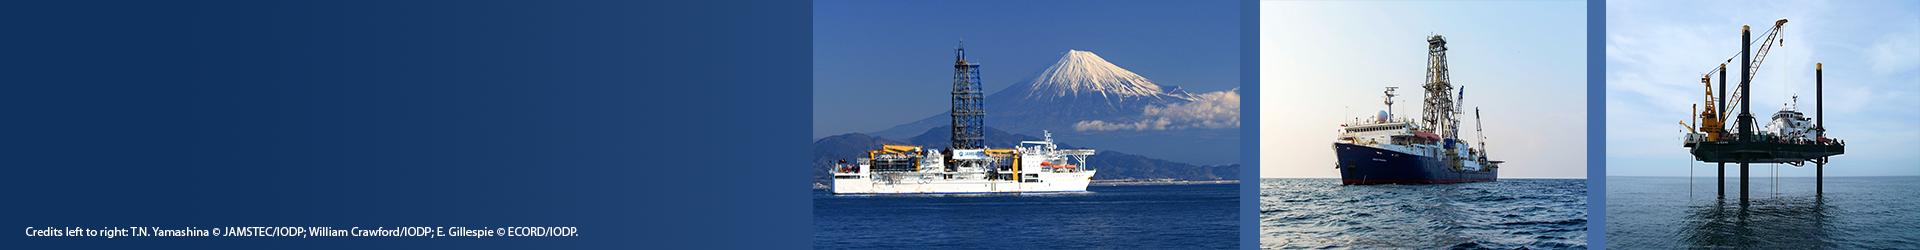 The new Scientific Ocean Drilling Bibliographic Database